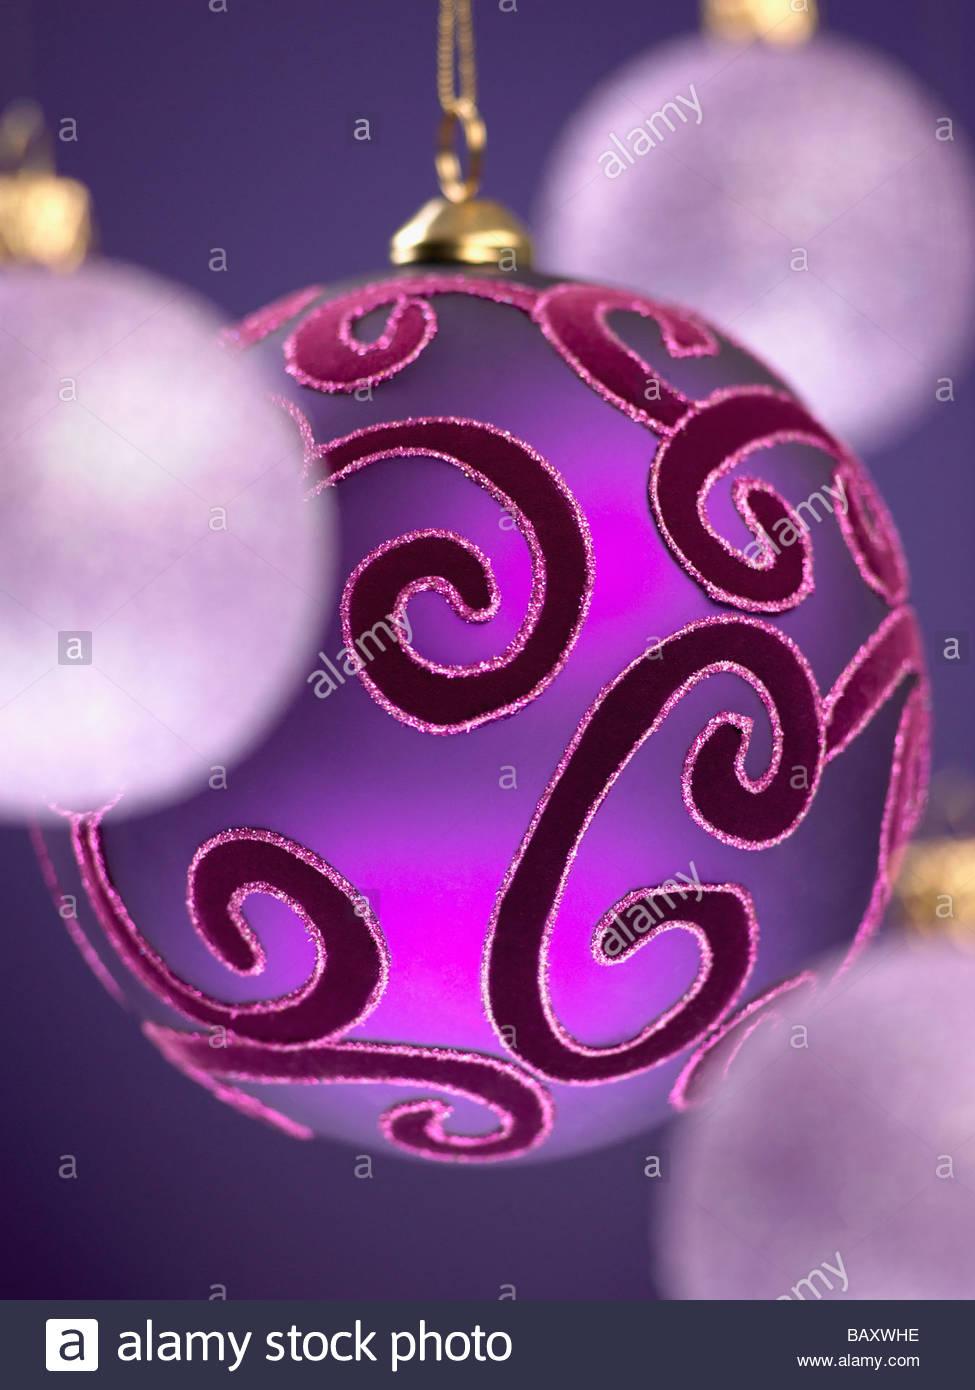 Cerca de violeta, adornos de Navidad Imagen De Stock